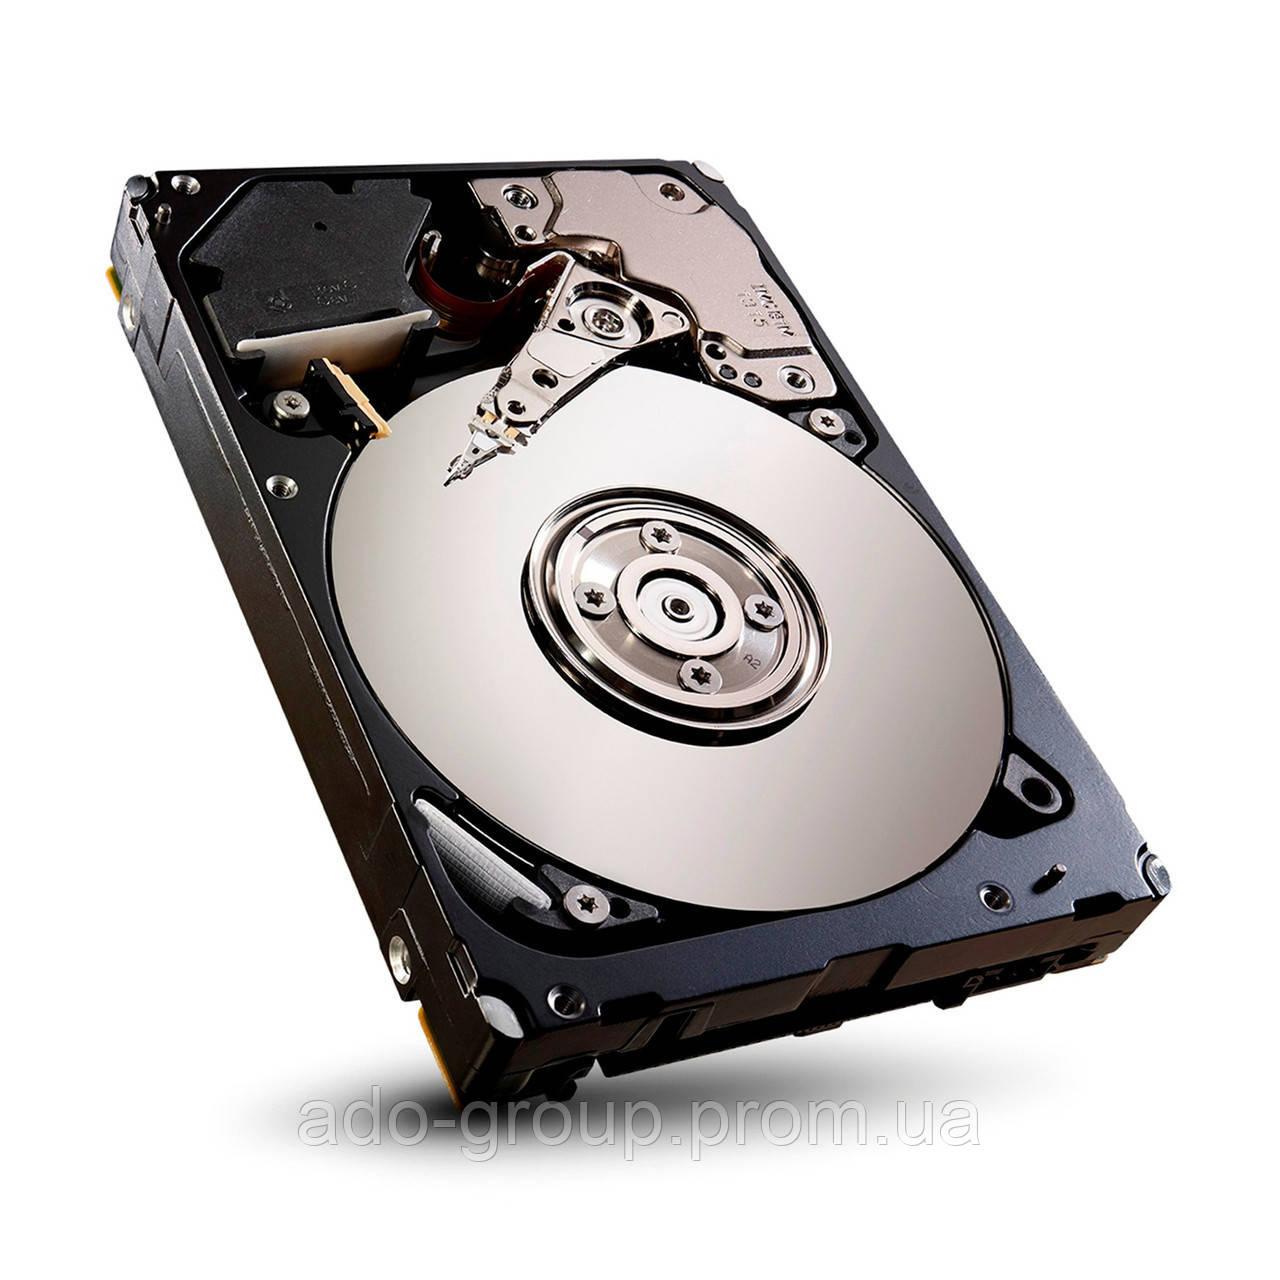 "1GR201-150 Жесткий диск Dell 1800GB SAS 10K  2.5"" +"